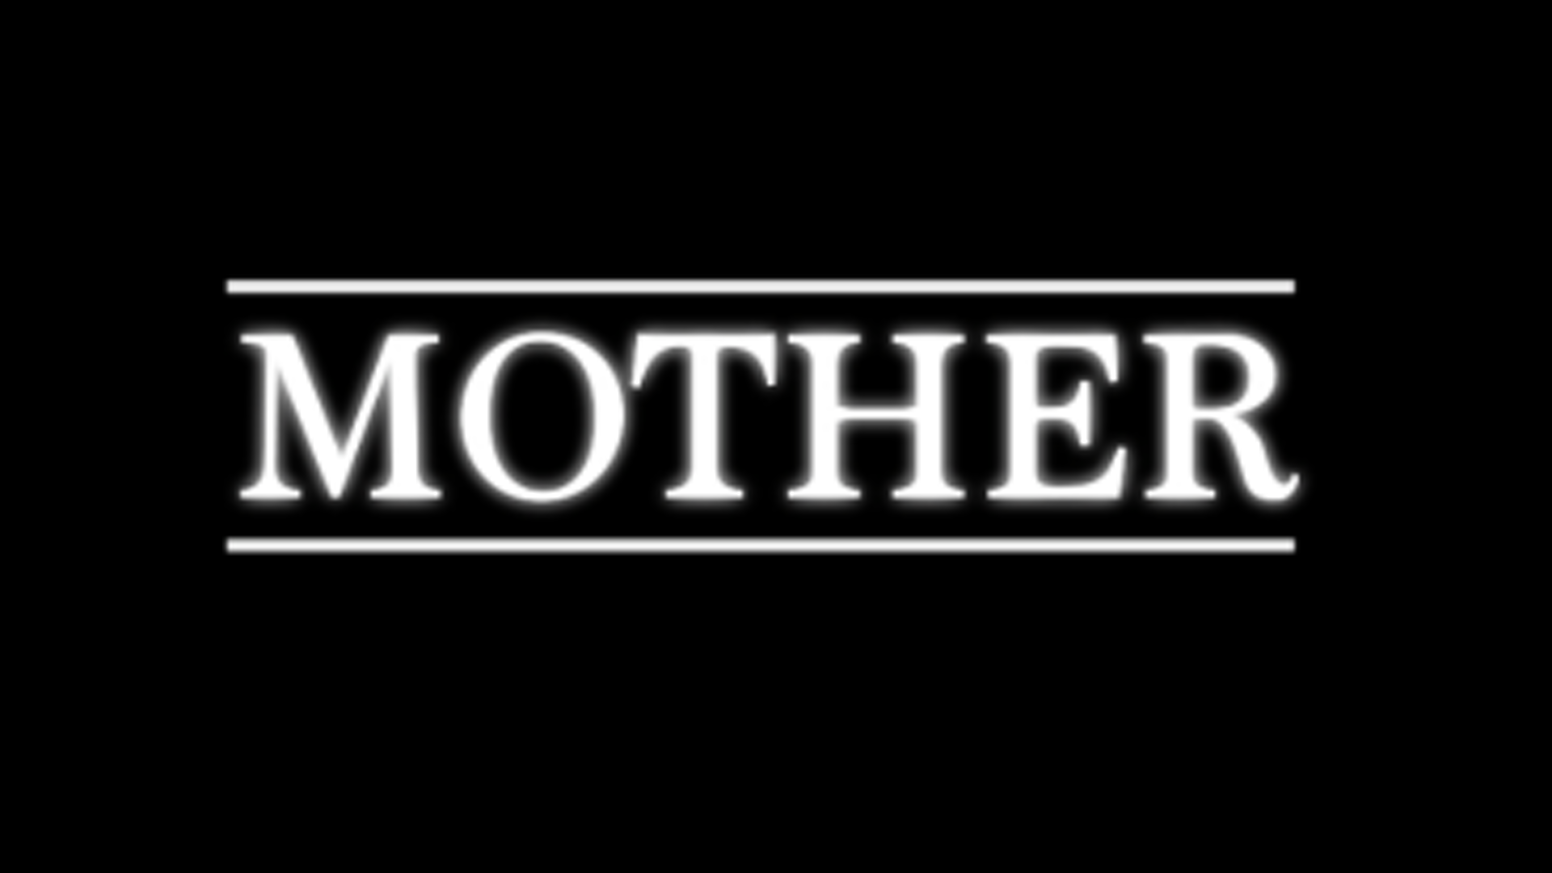 Mother - a short, moving drama by Jumaan Short by Jumaan Short